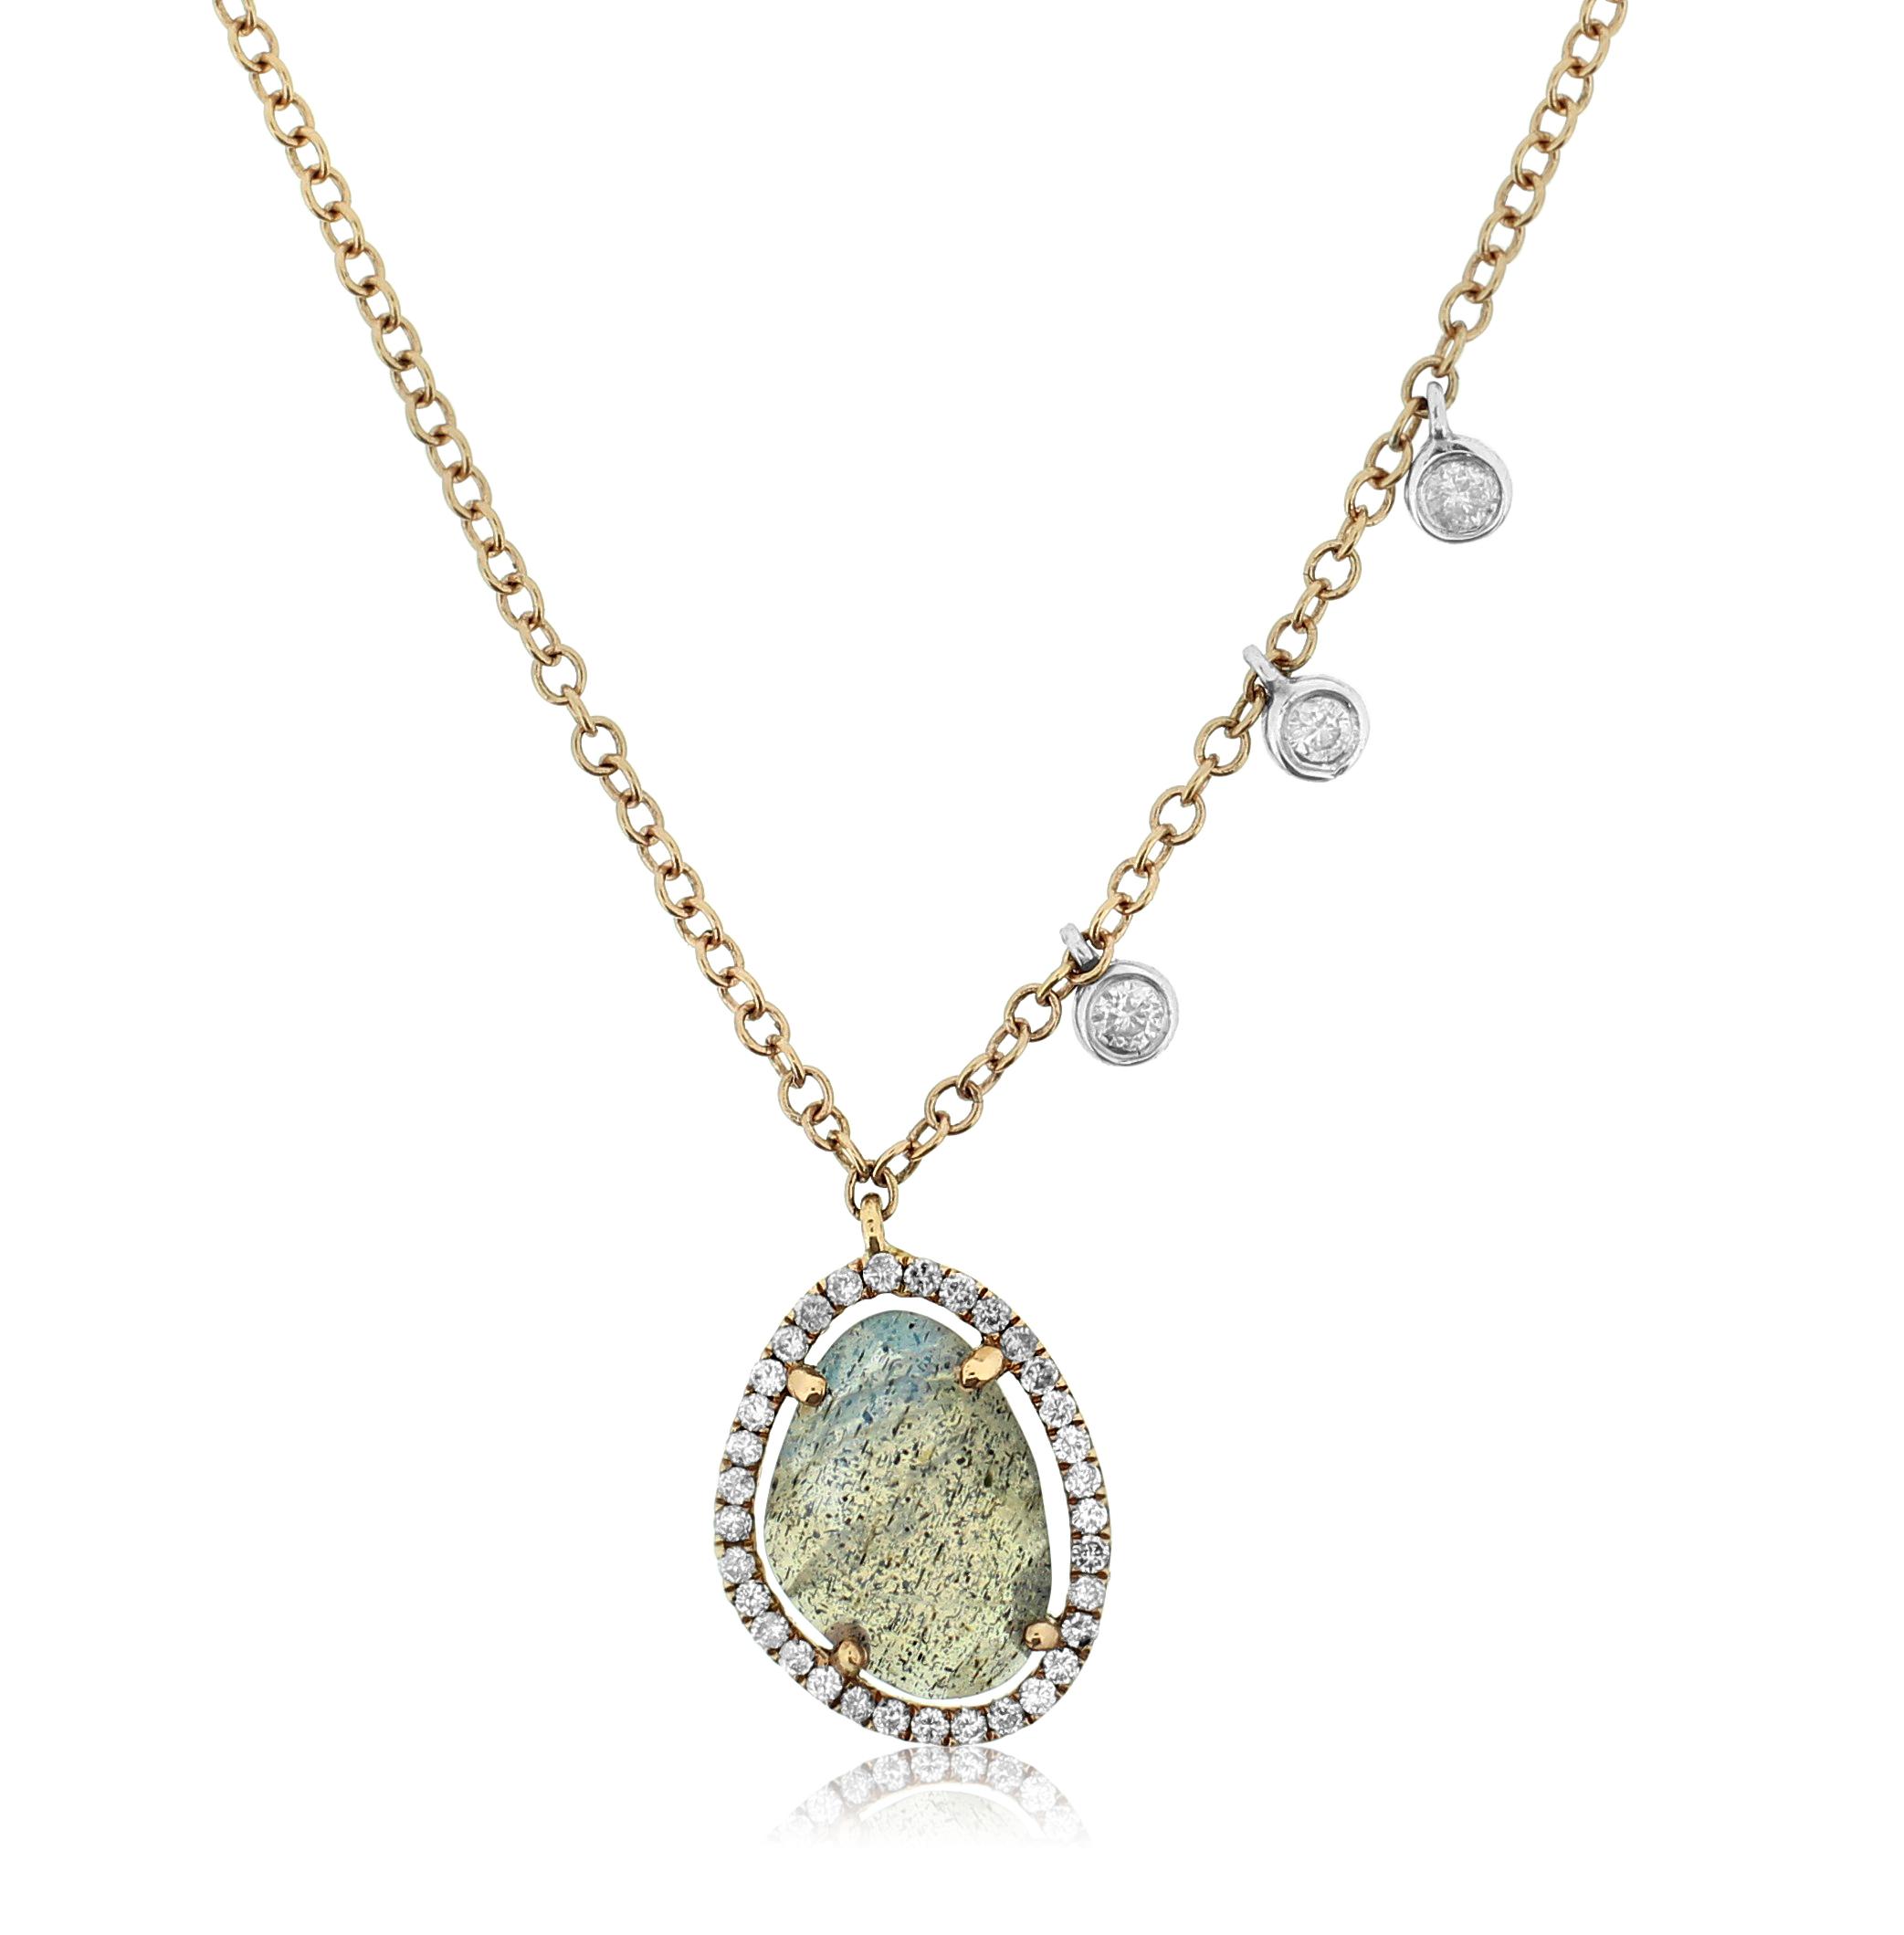 18 carat gold labradorite and necklace